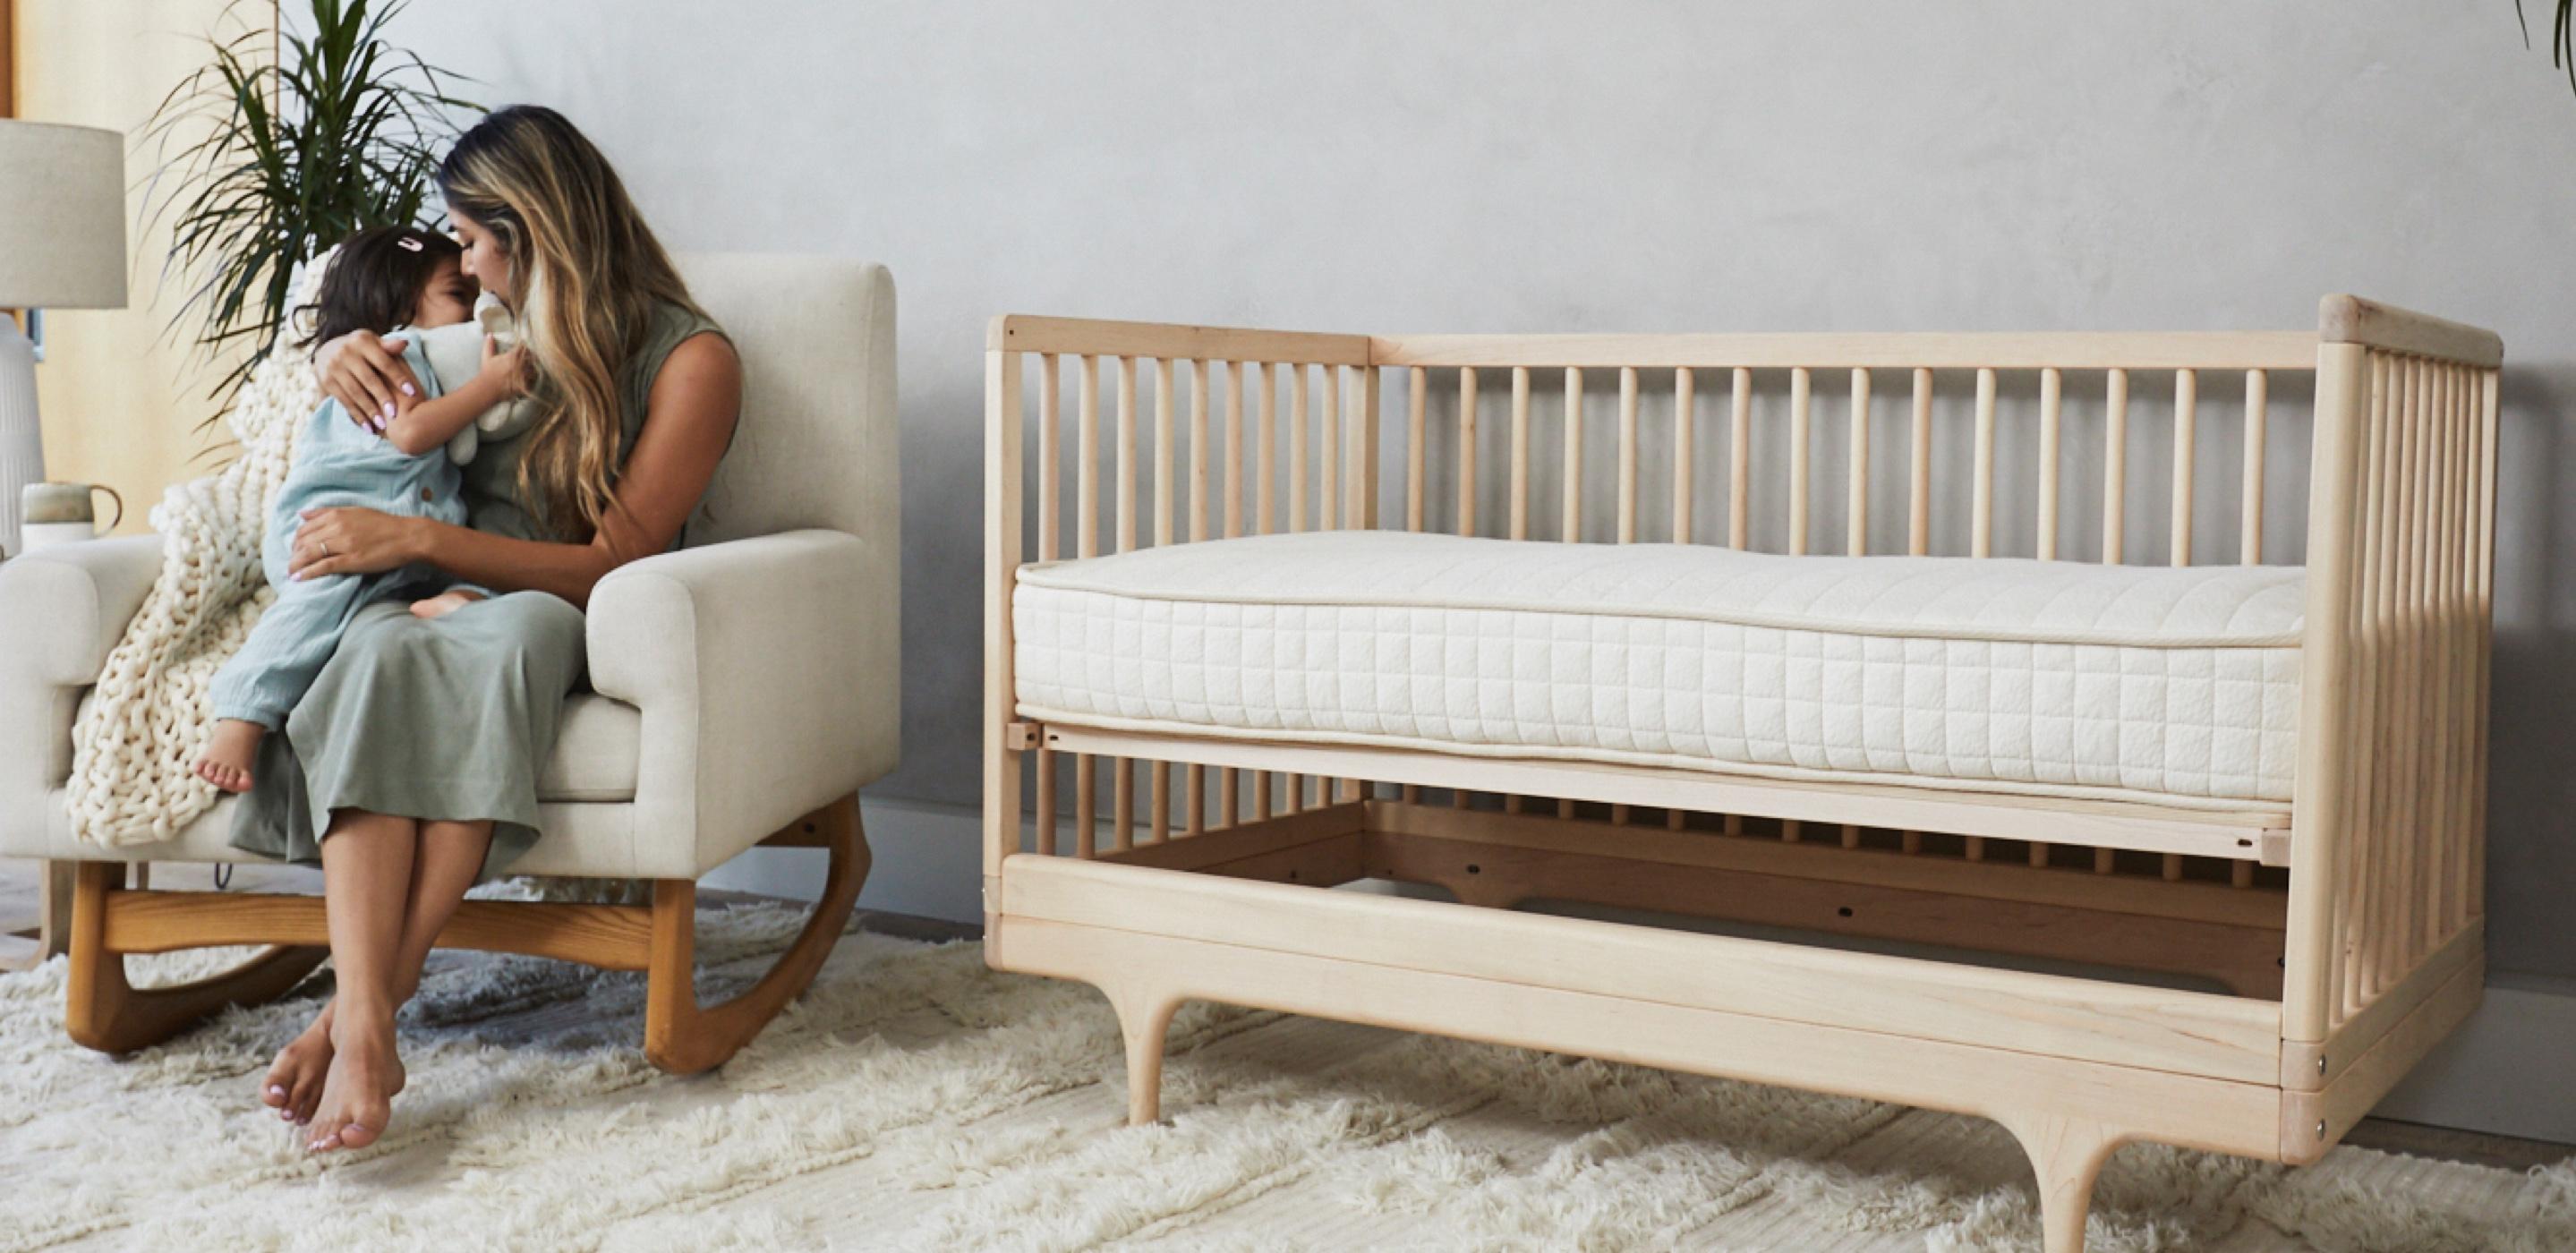 avocado baby mattress